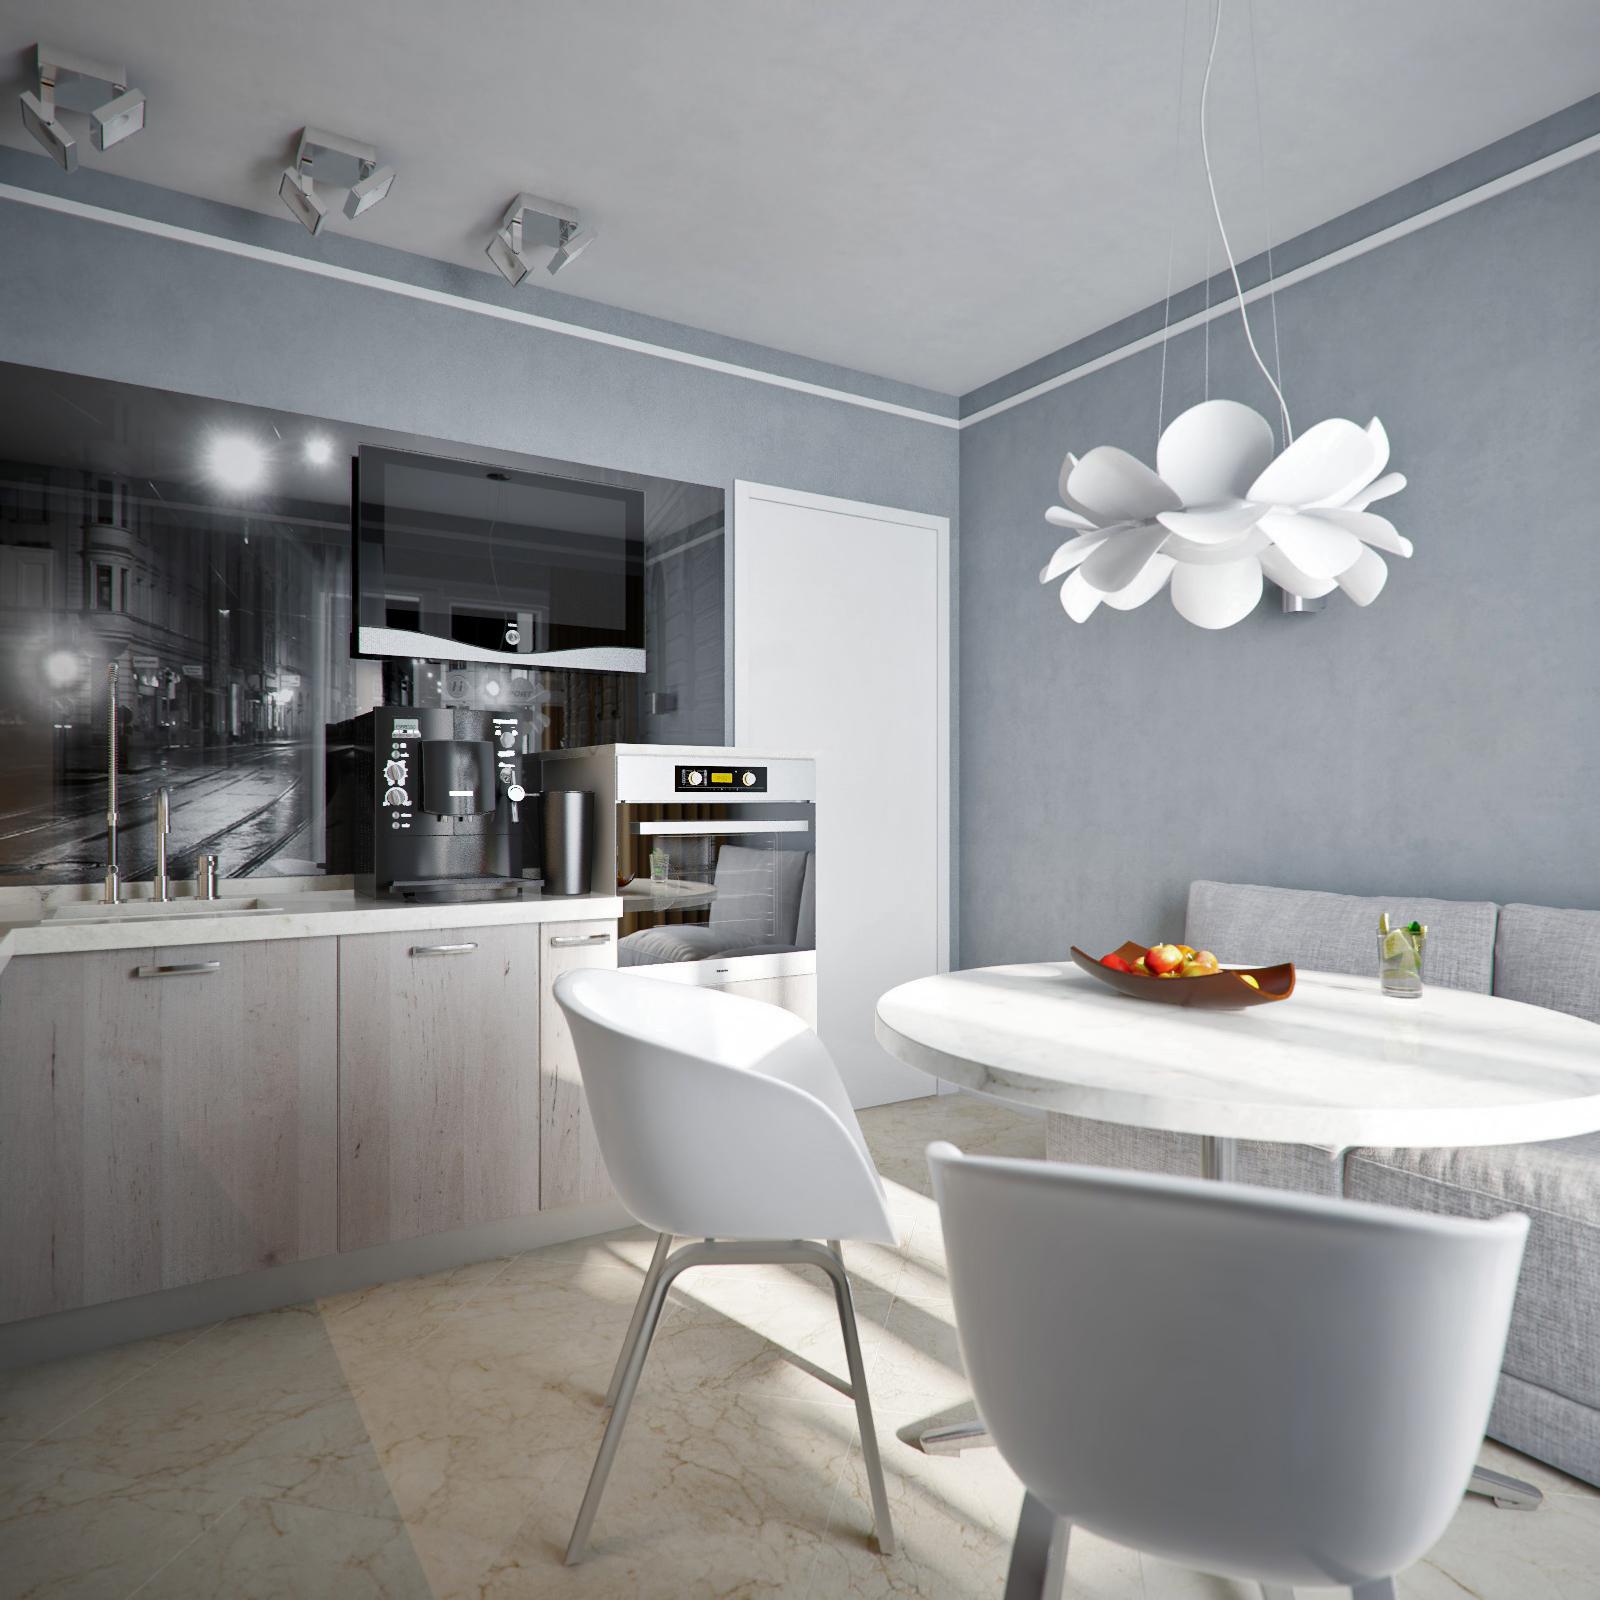 Homeinterior Lighting Ideas: Interior Design Ideas